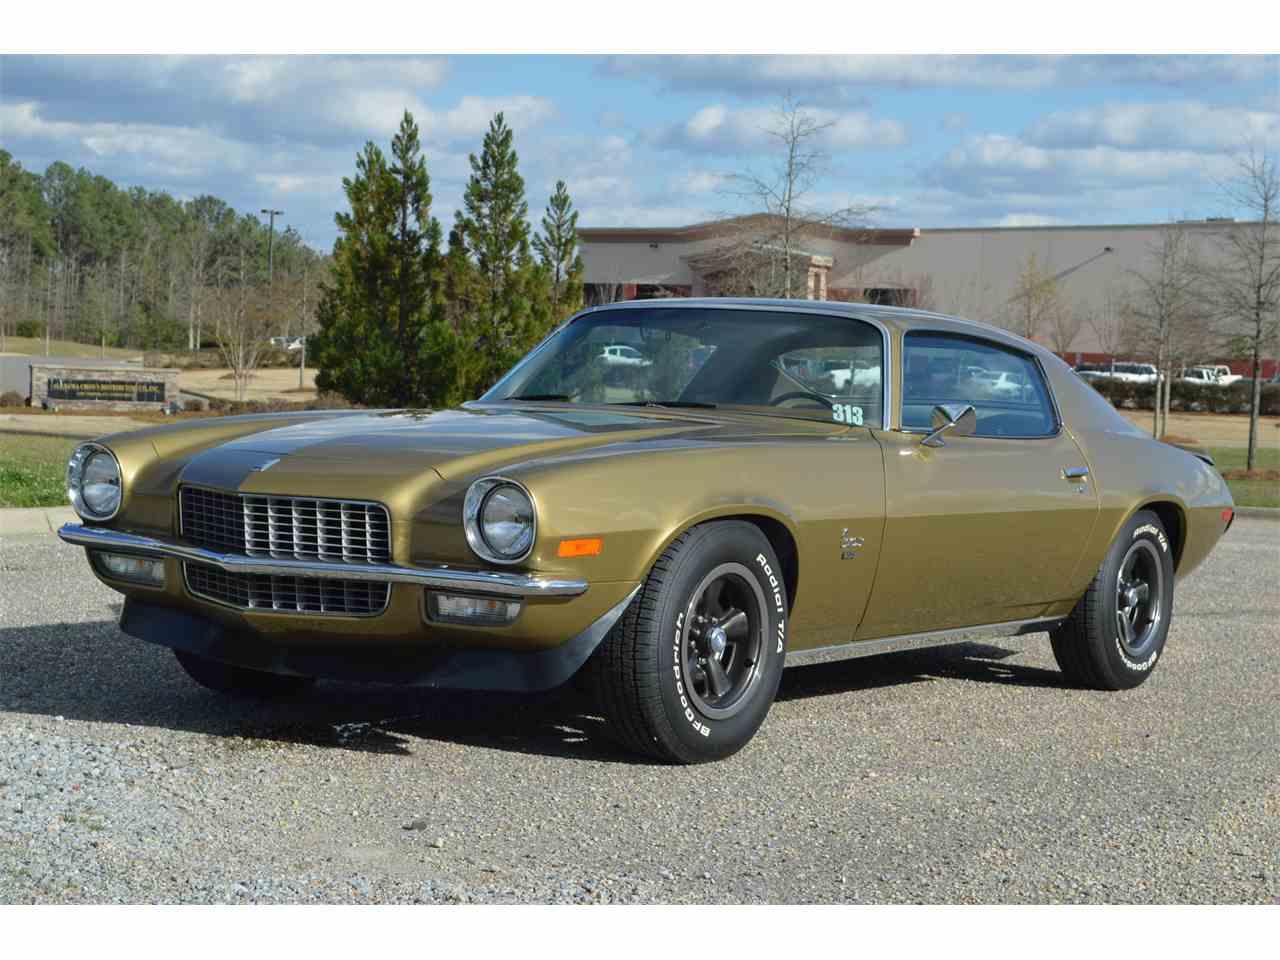 Large Picture of Classic '70 Chevrolet Camaro located in Alabaster Alabama - $27,900.00 - M517